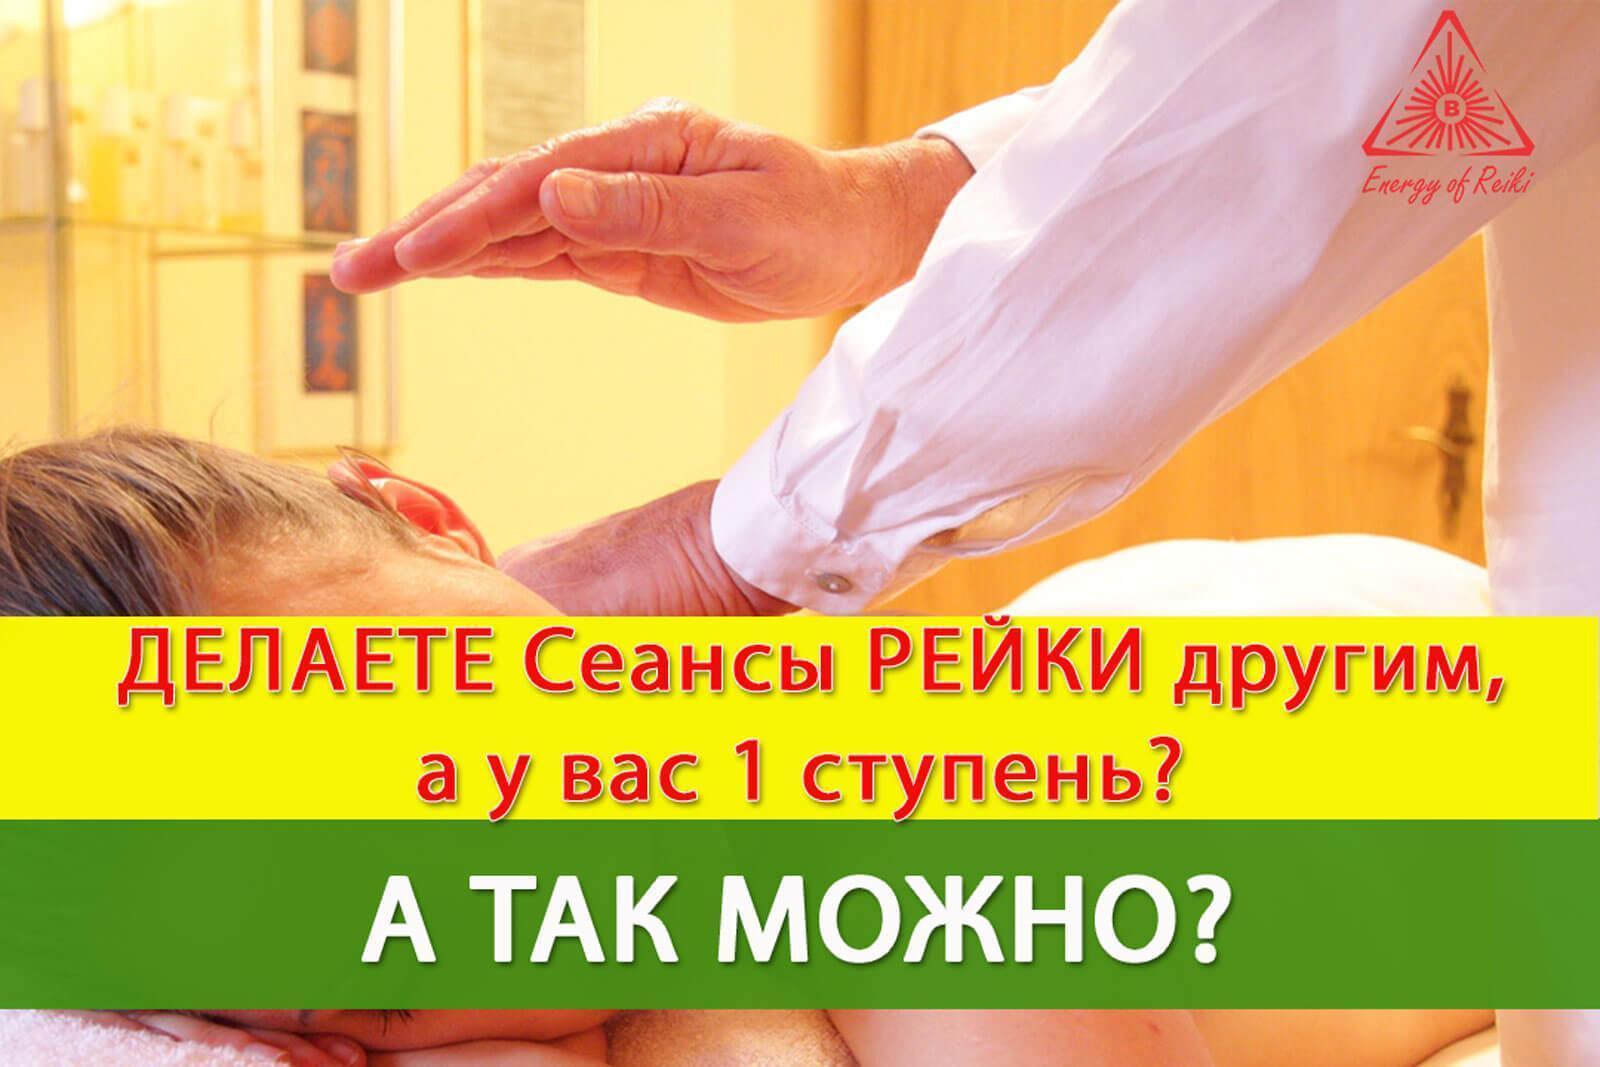 Сеанс Рейки Пациенту Сеансы Рейки другим людям